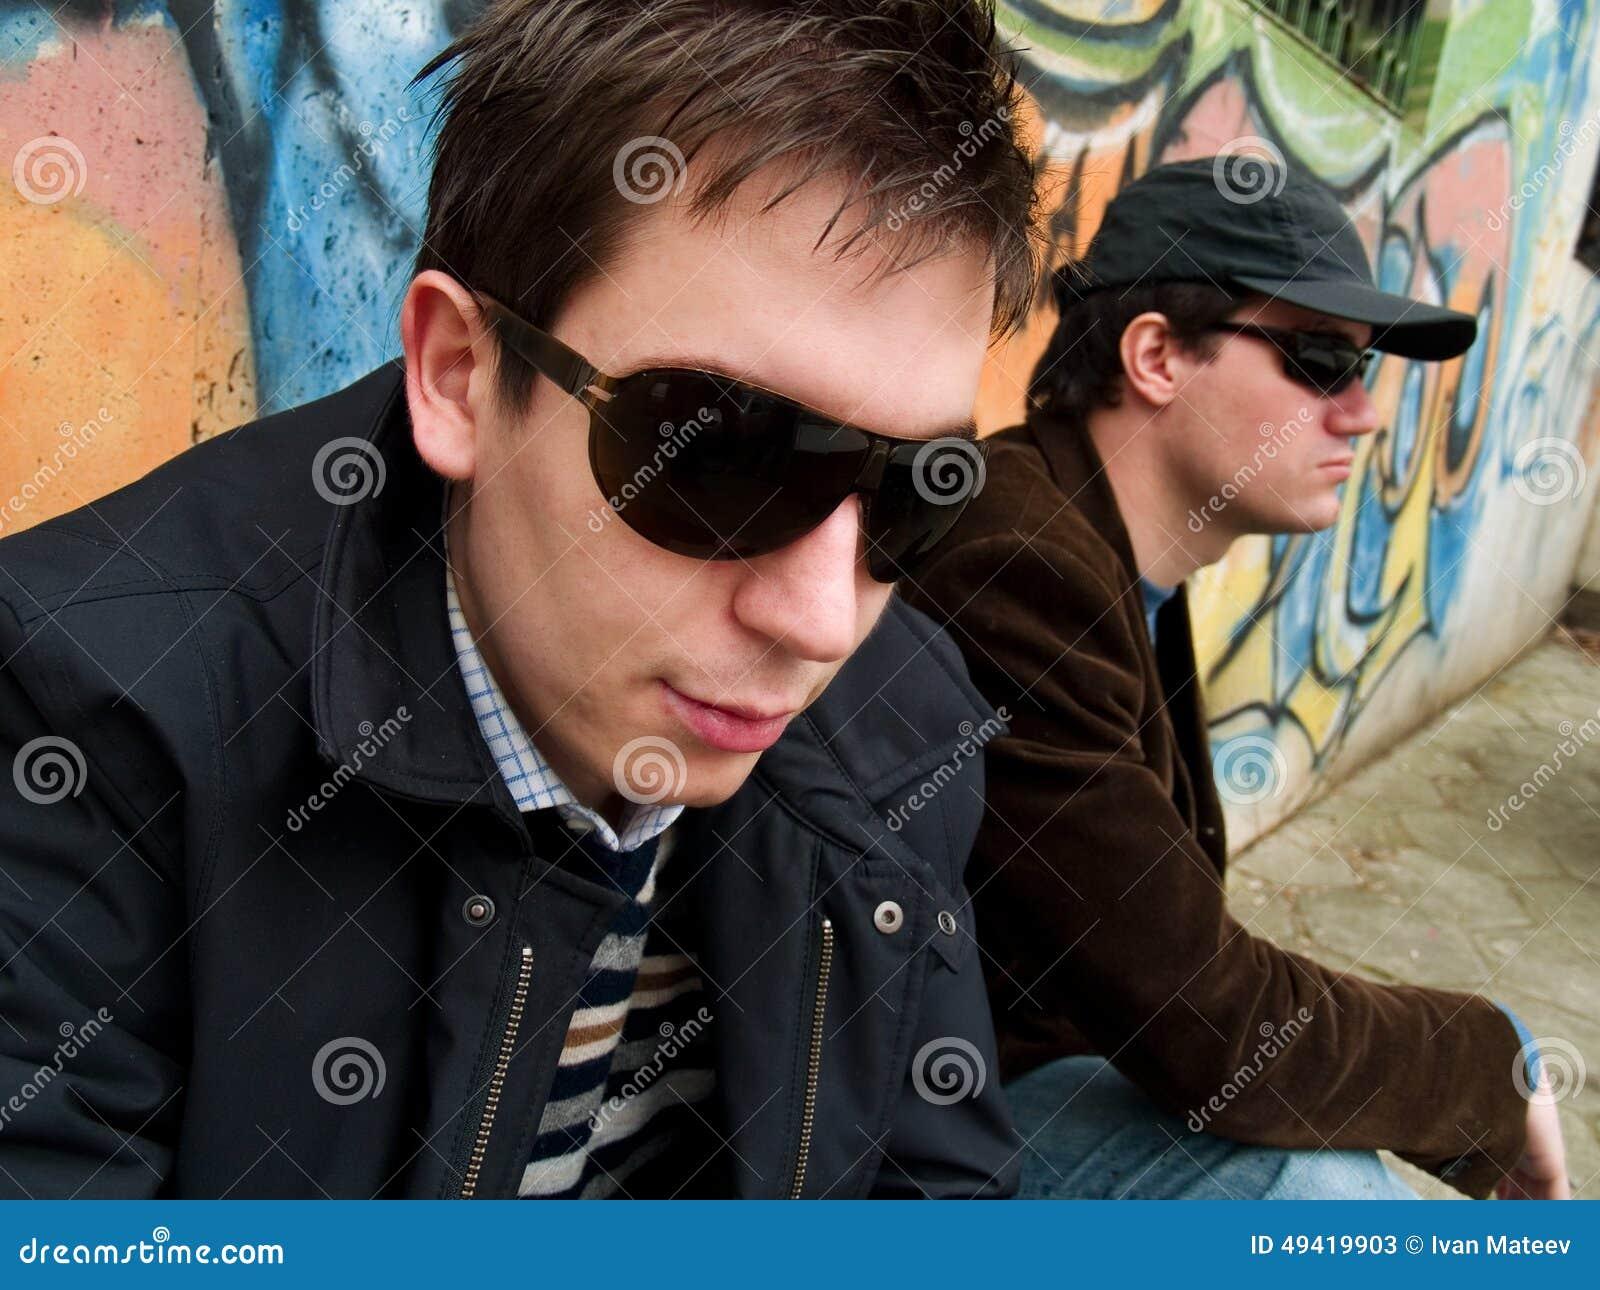 Urban Guys